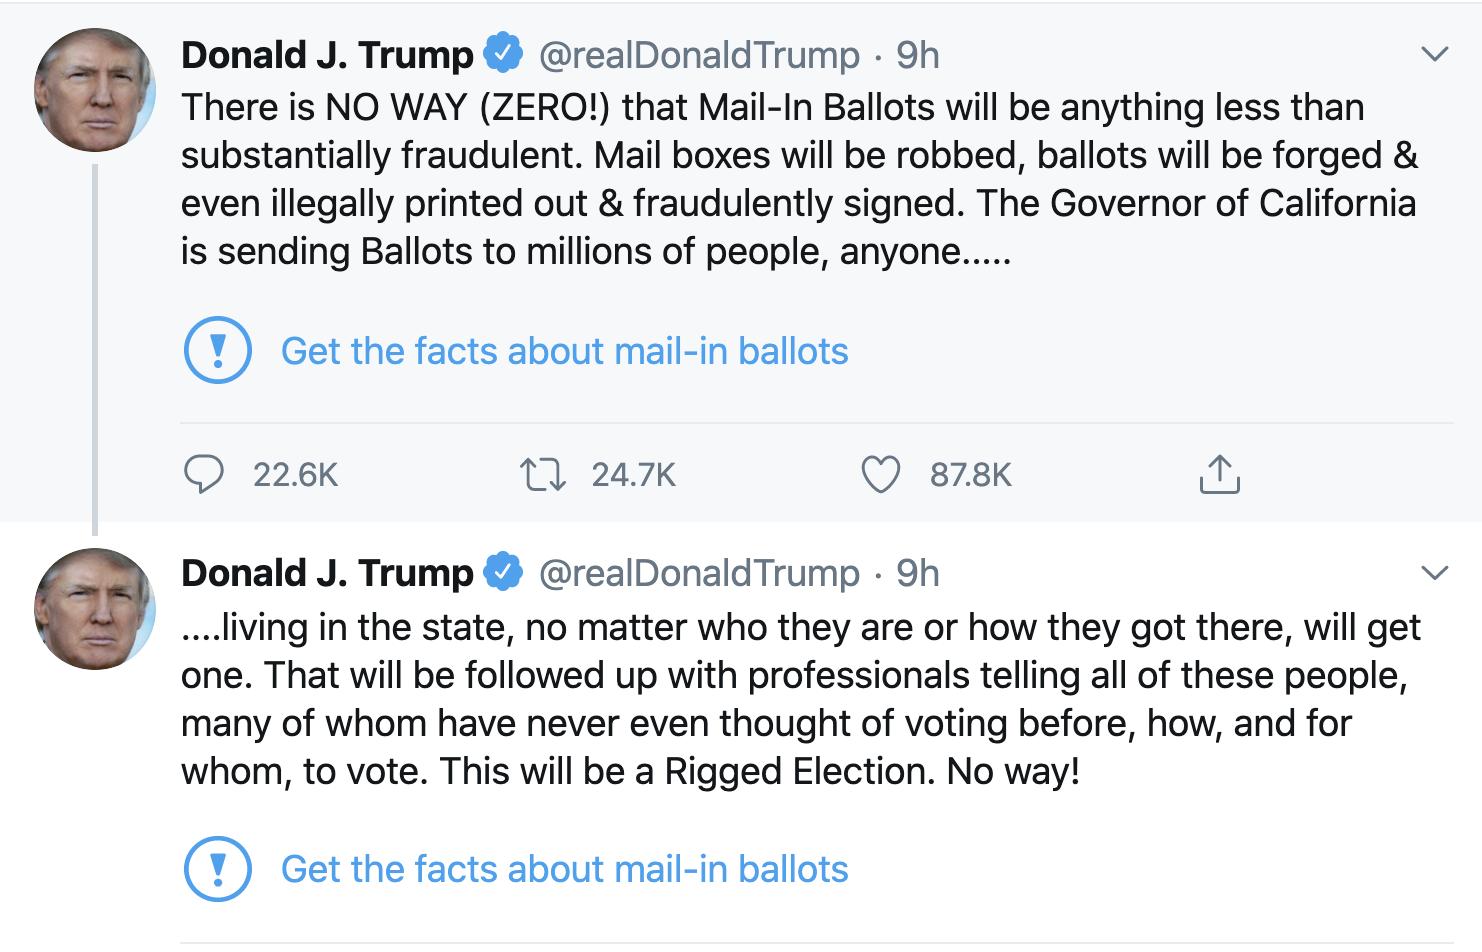 Twitter Finally Slaps Fact-Checks On Trump's Tweets